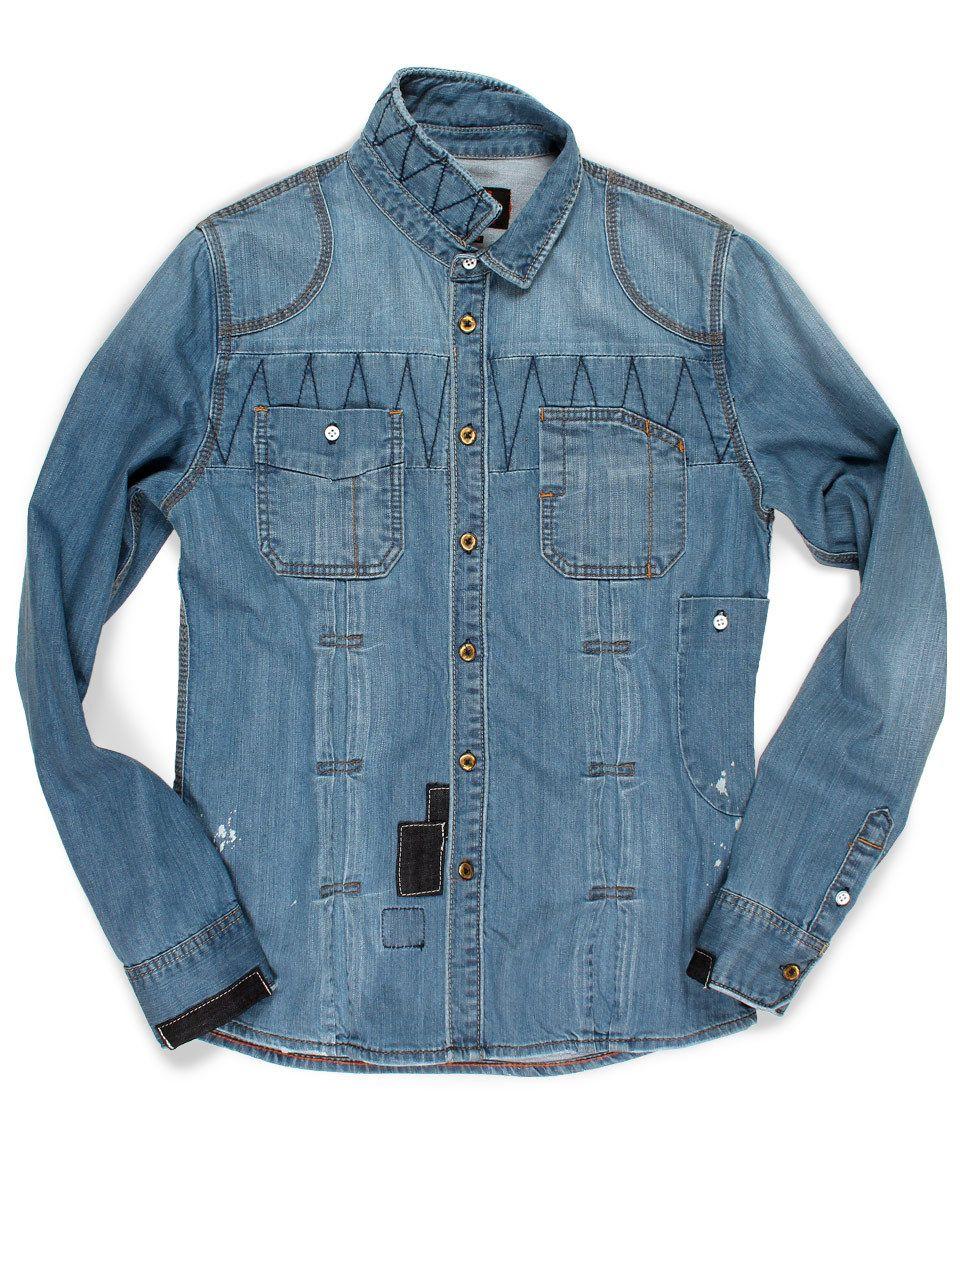 DENIM - Denim shirts CO Lowest Price Cheap Sale 2018 Shop Offer Cheap Online VgdbRPv9